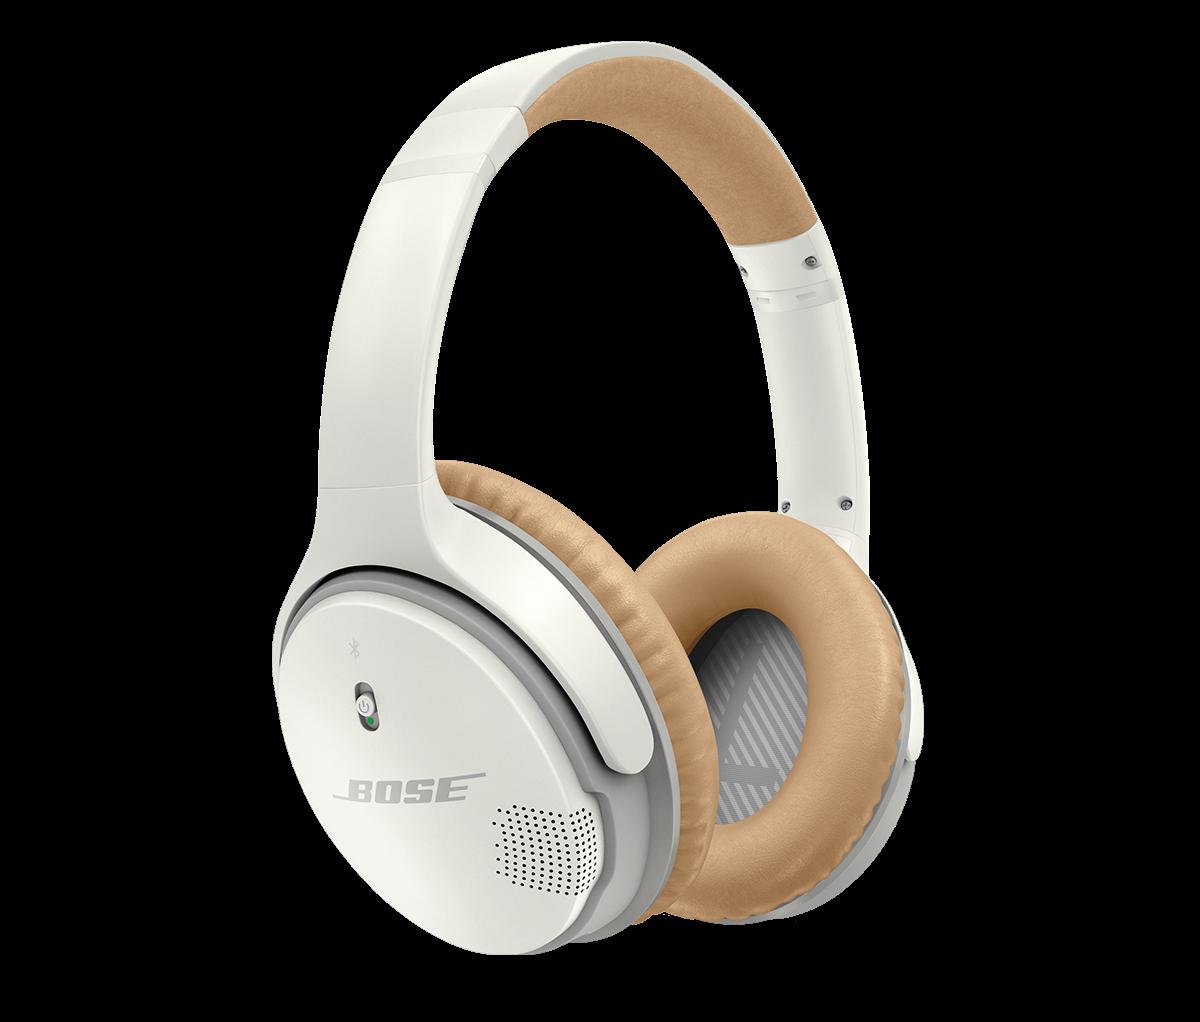 Soundlink Wireless Around Ear Headphones Ii Bose Headphones Wireless Headphones Bluetooth Headphones